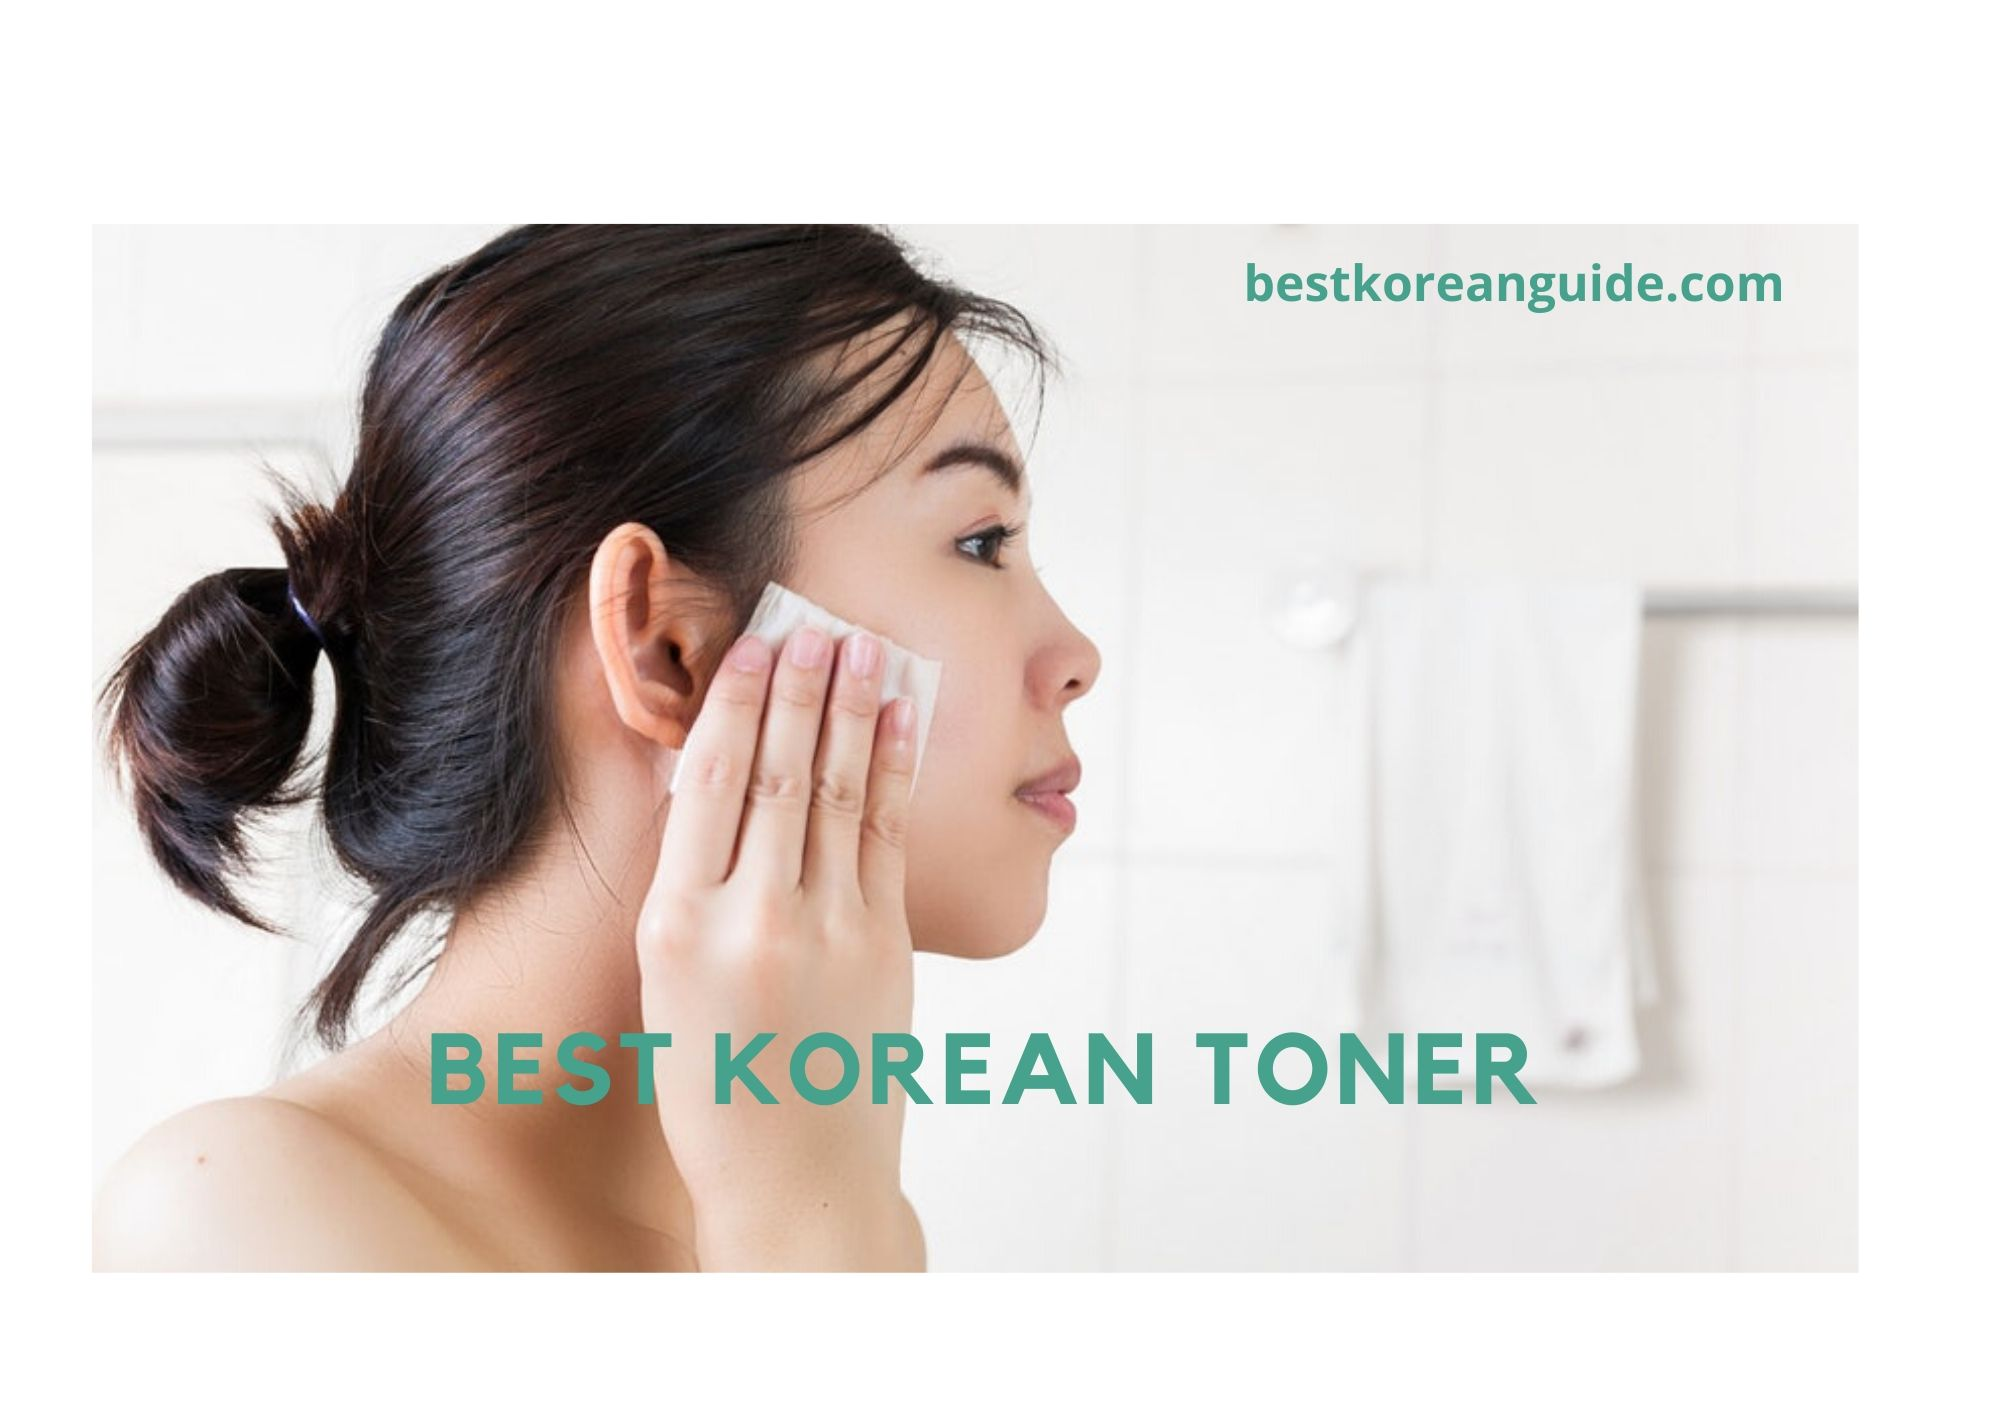 Best korean toner